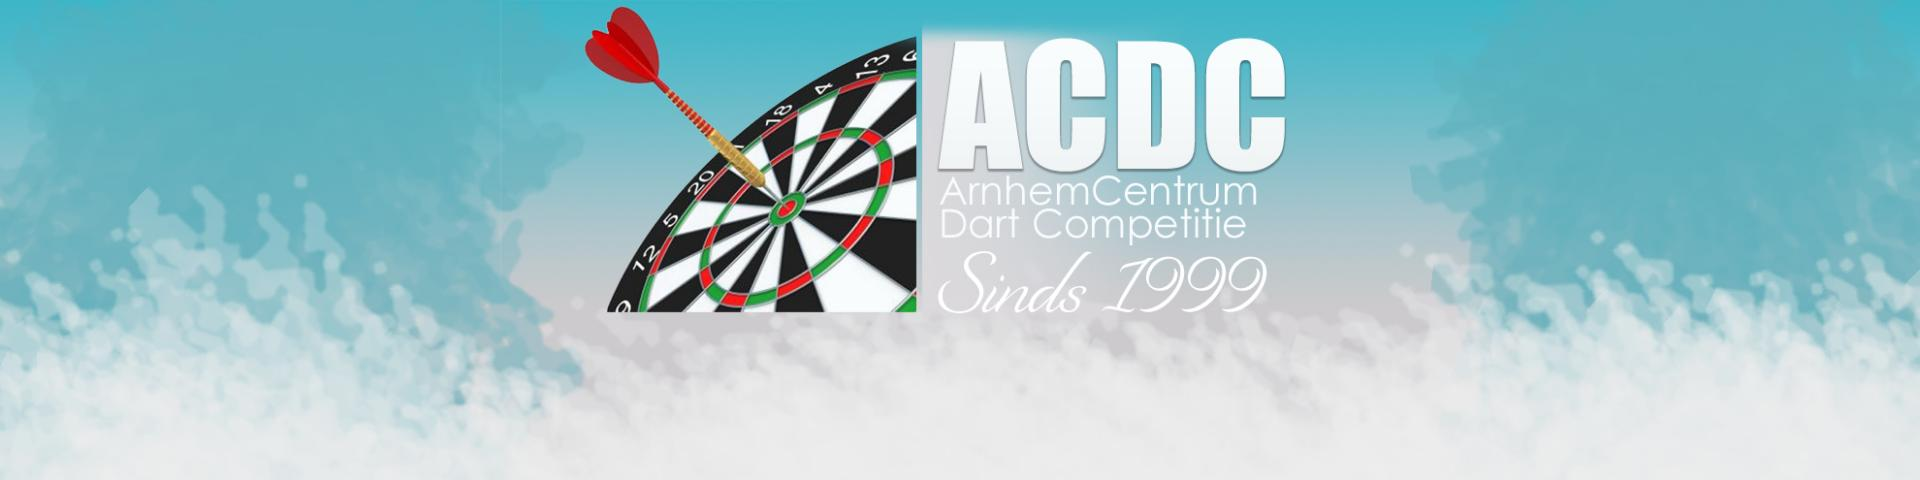 Het grote ACDC eindtoernooi